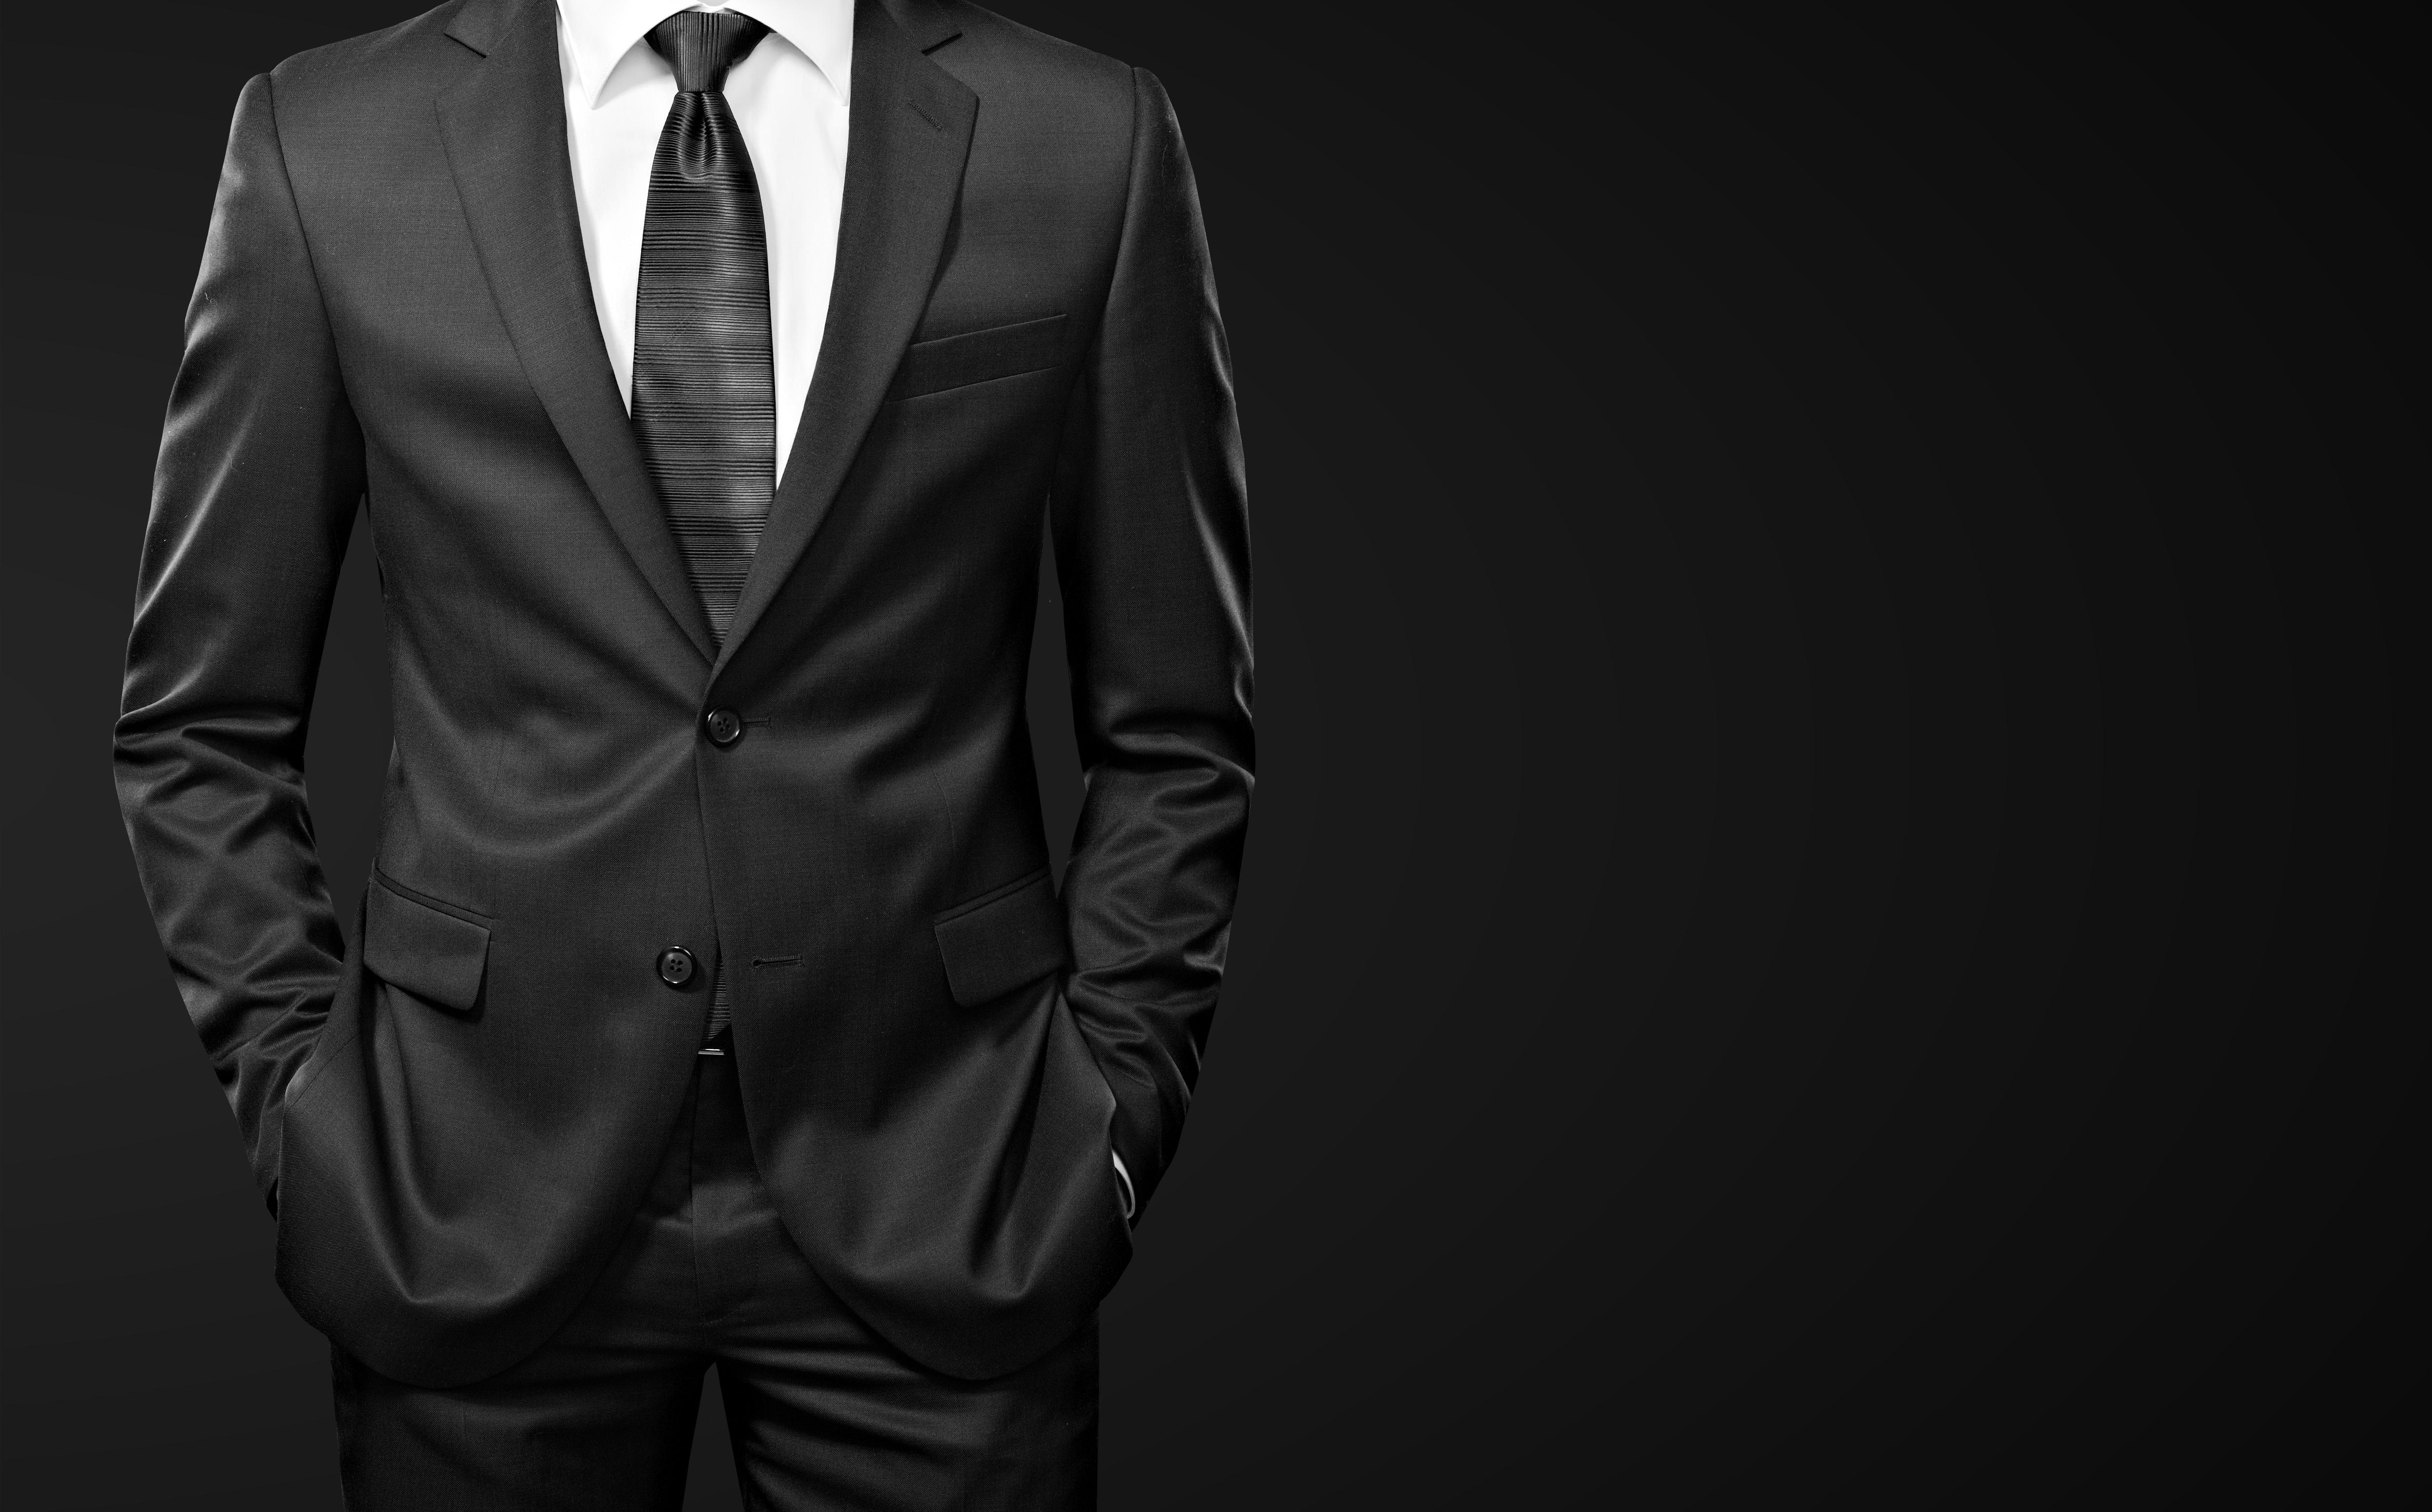 Suit Photos  Pexels  Free Stock Photos